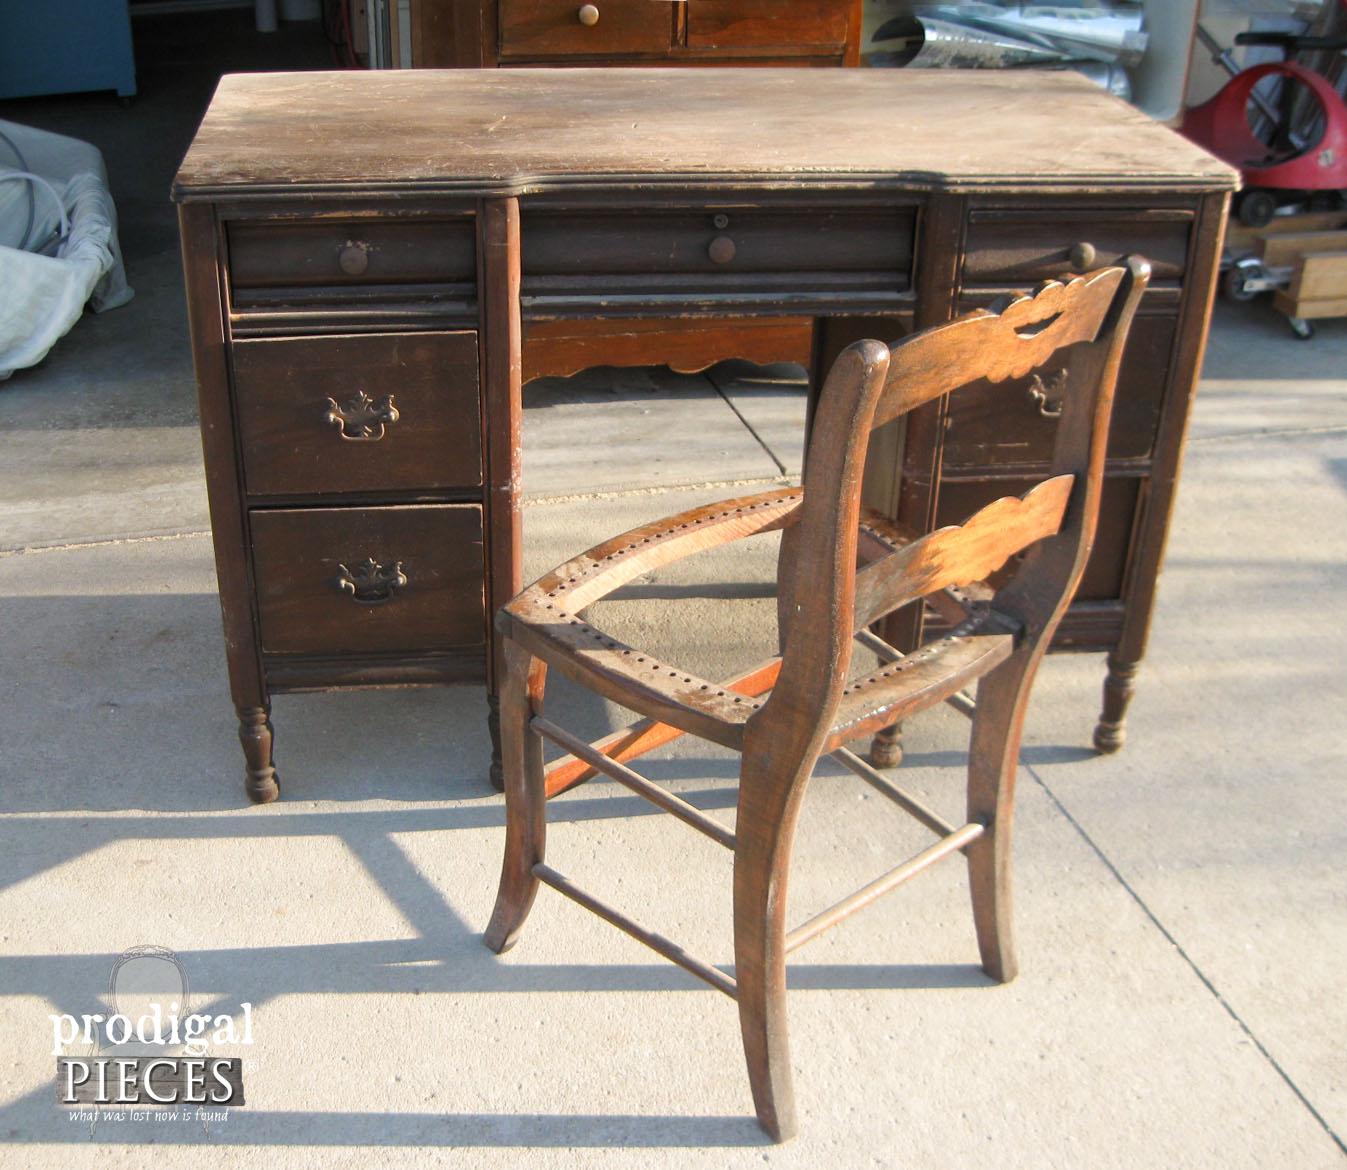 Damaged Antique Desk Before | Prodigal Pieces | www.prodigalpieces.com